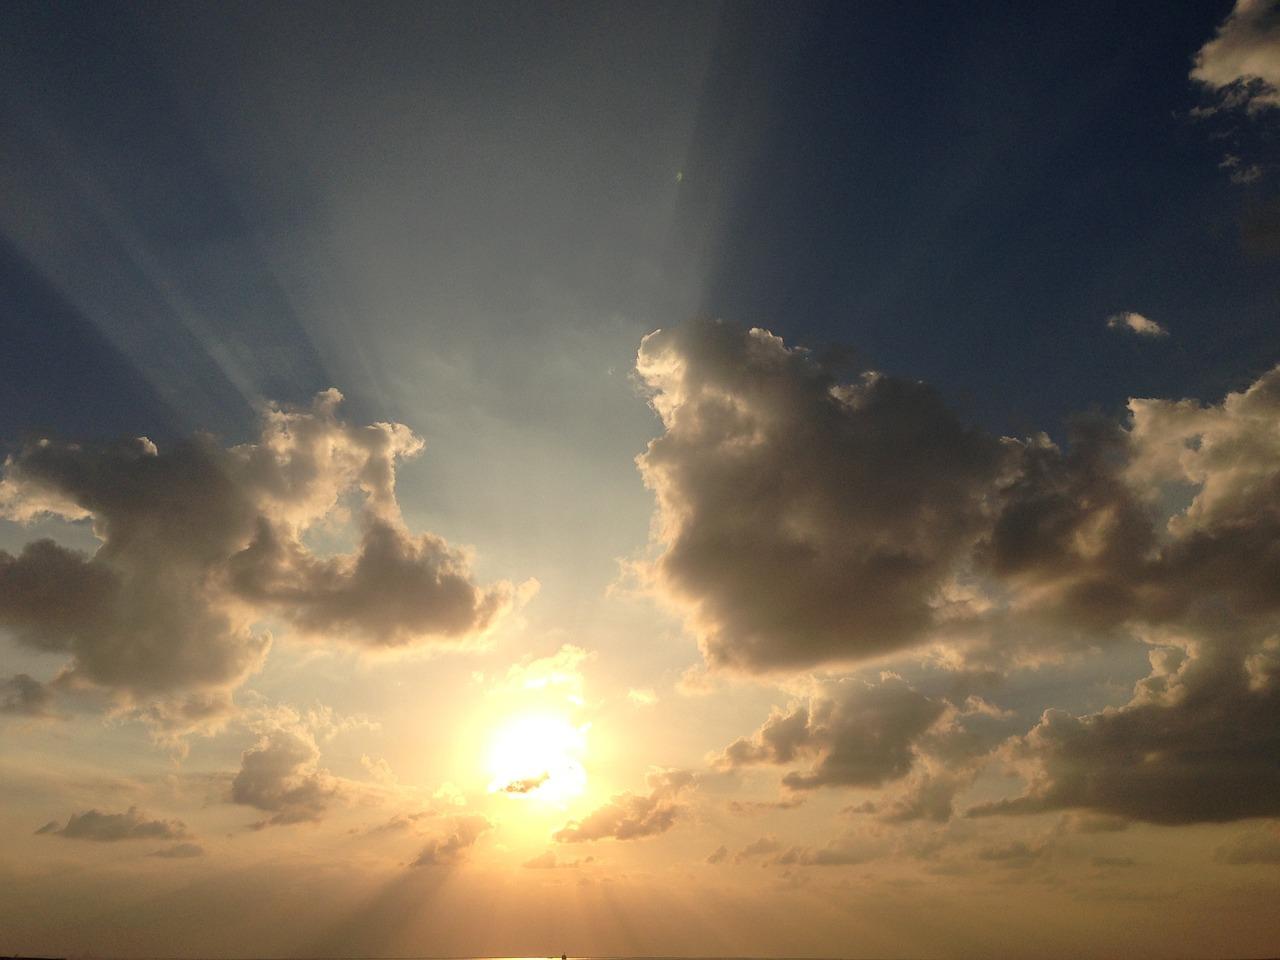 открытки фото небо с облаками и солнцем прошел пробы